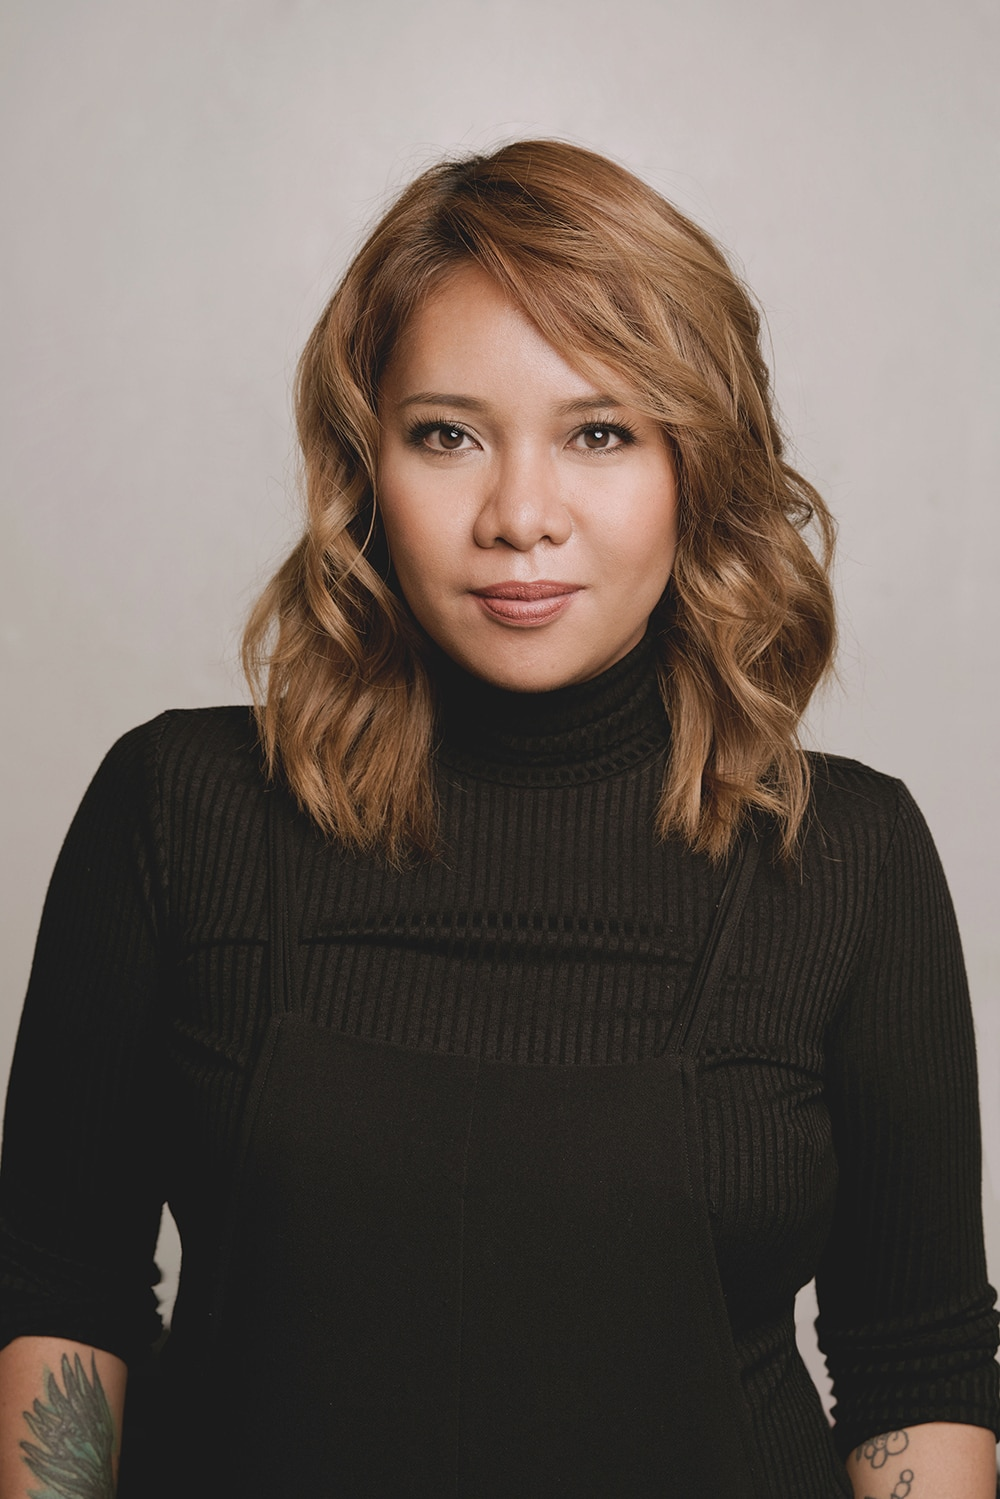 Professional Makeup Artist Chuchie